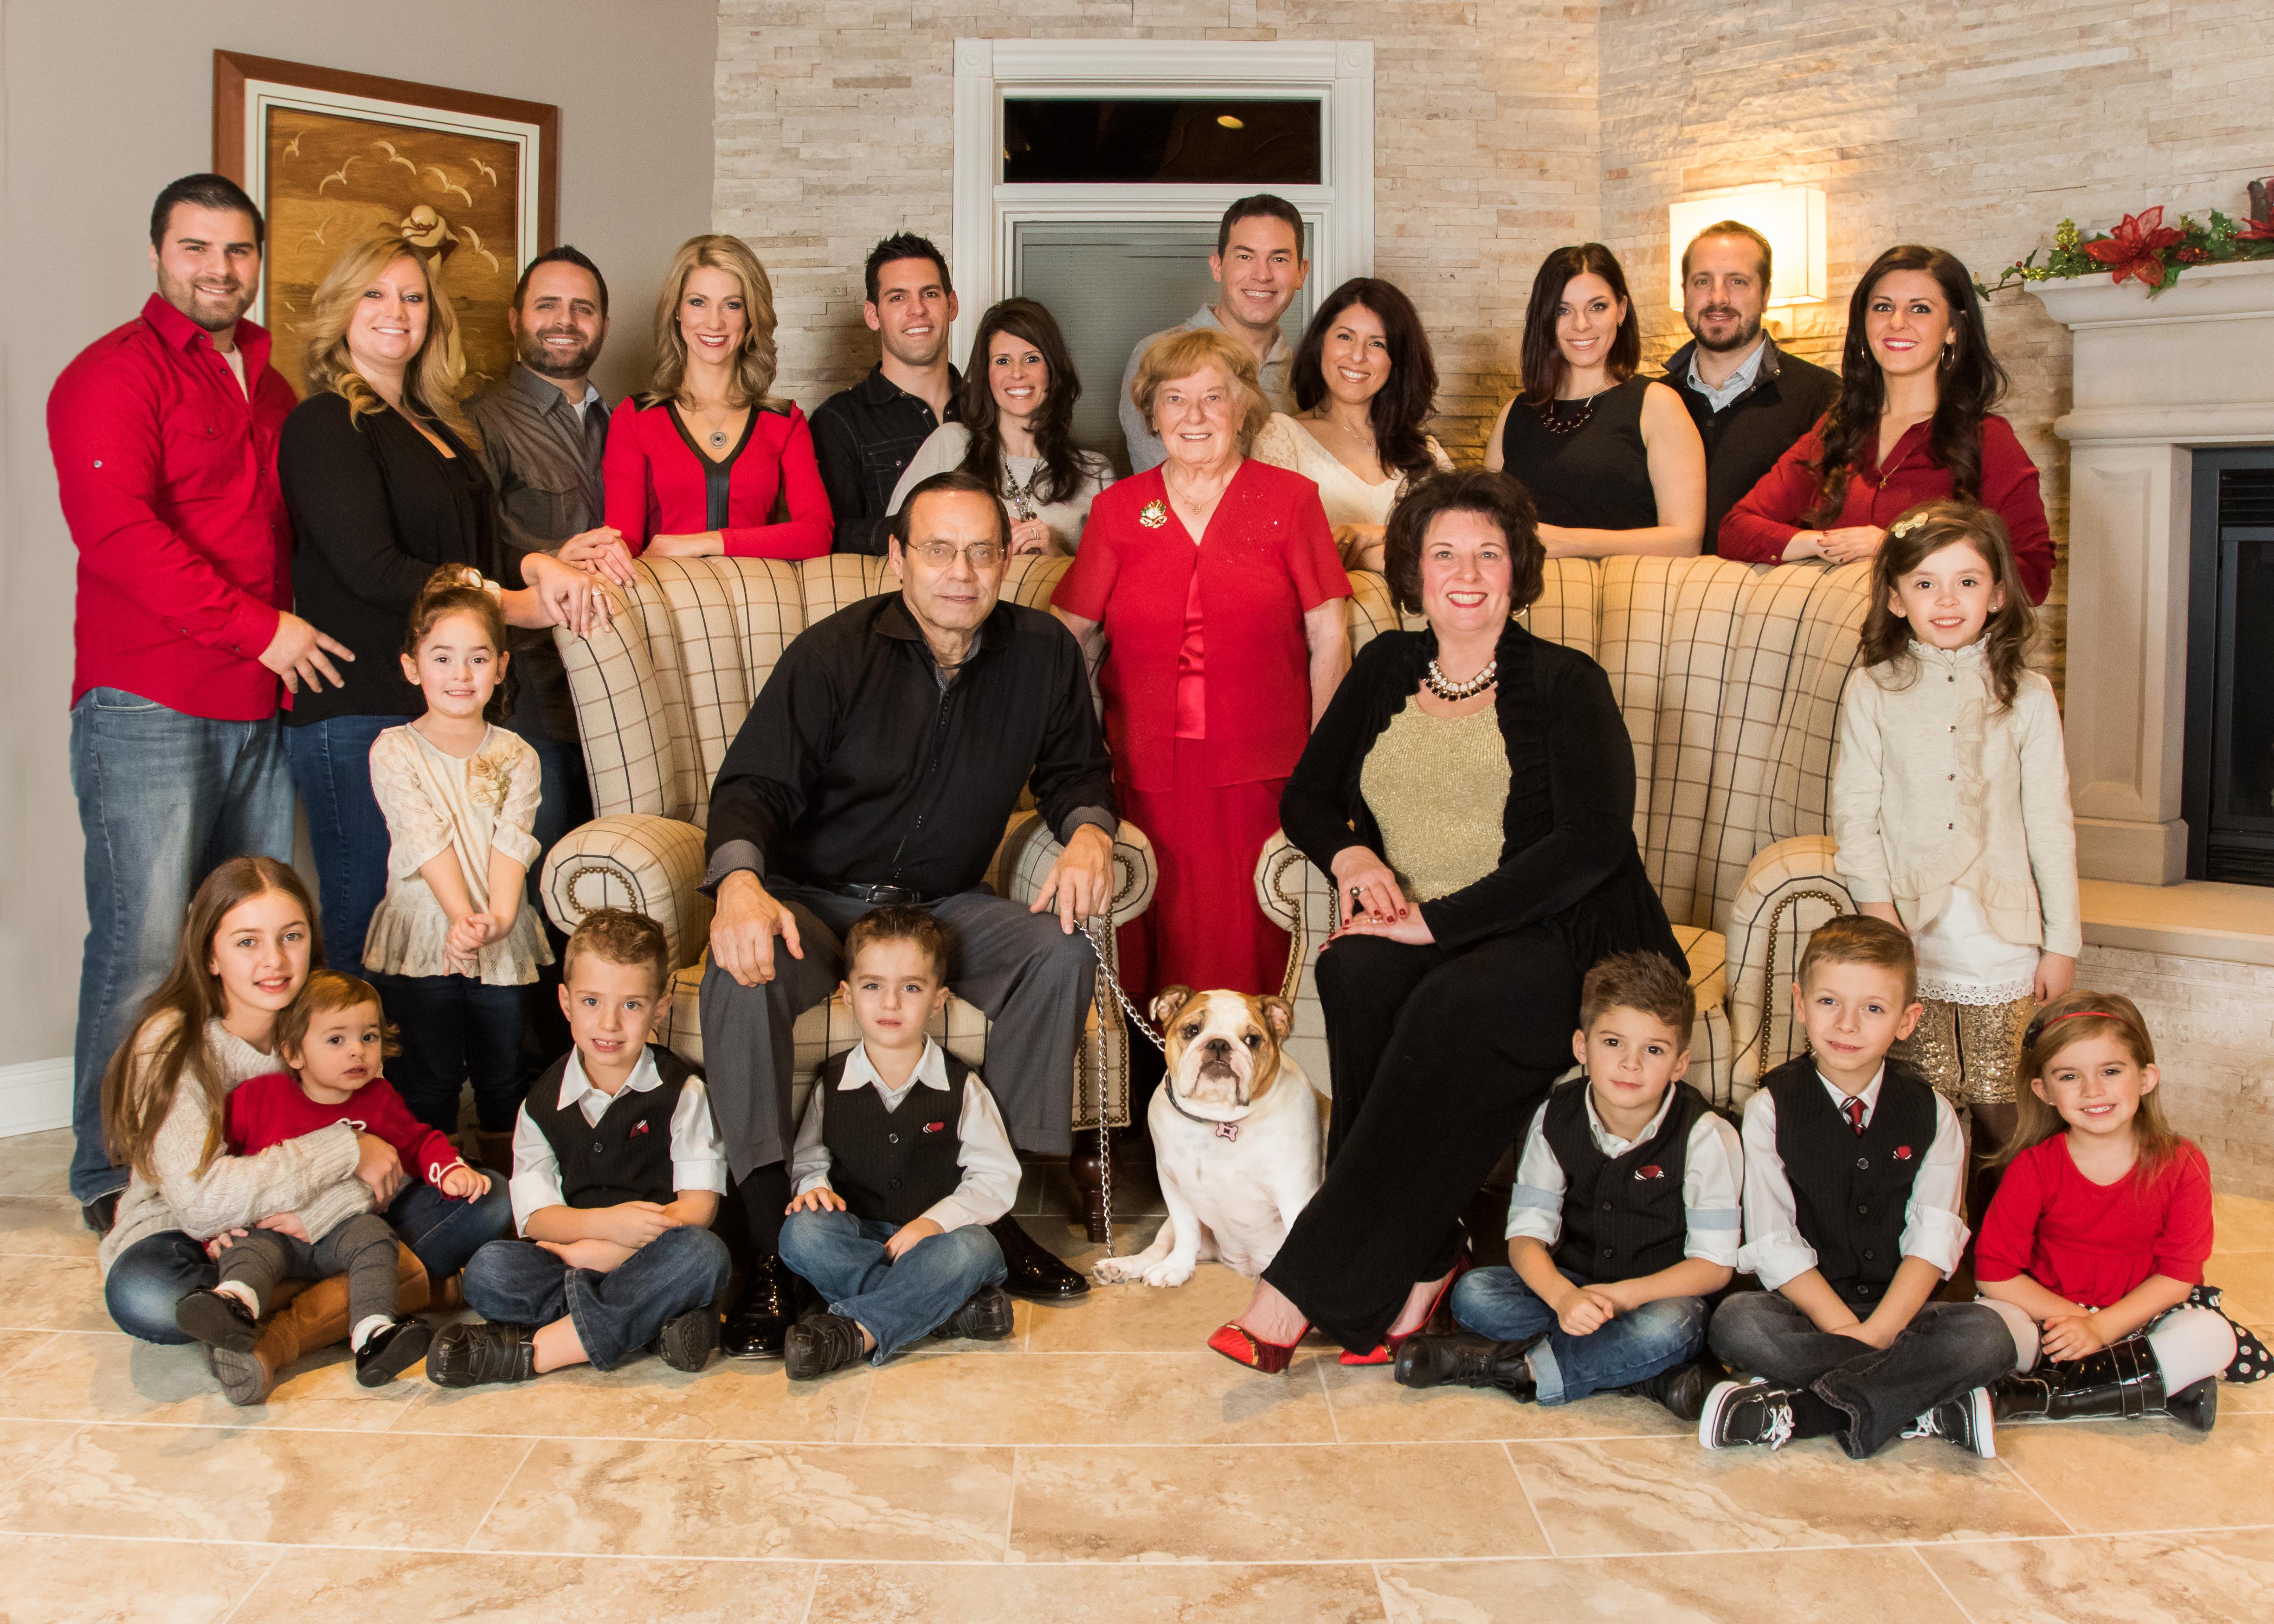 NorthEast Ohio Cleveland family photographer